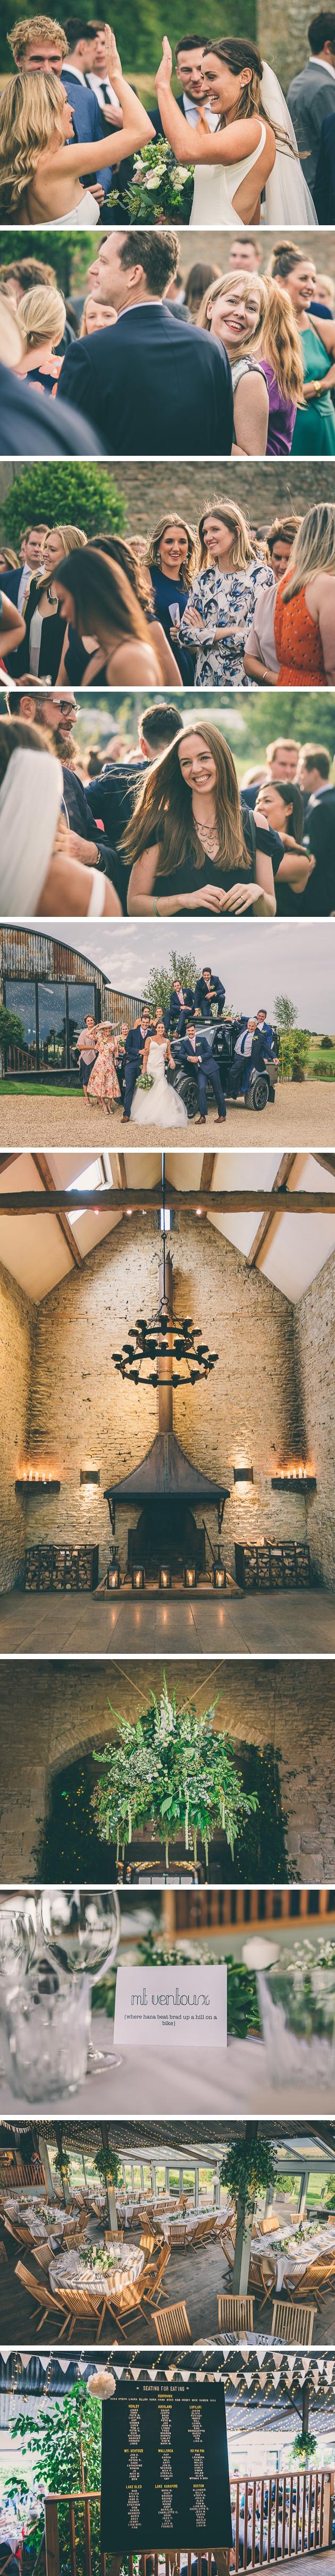 Table decor for a stone barn wedding